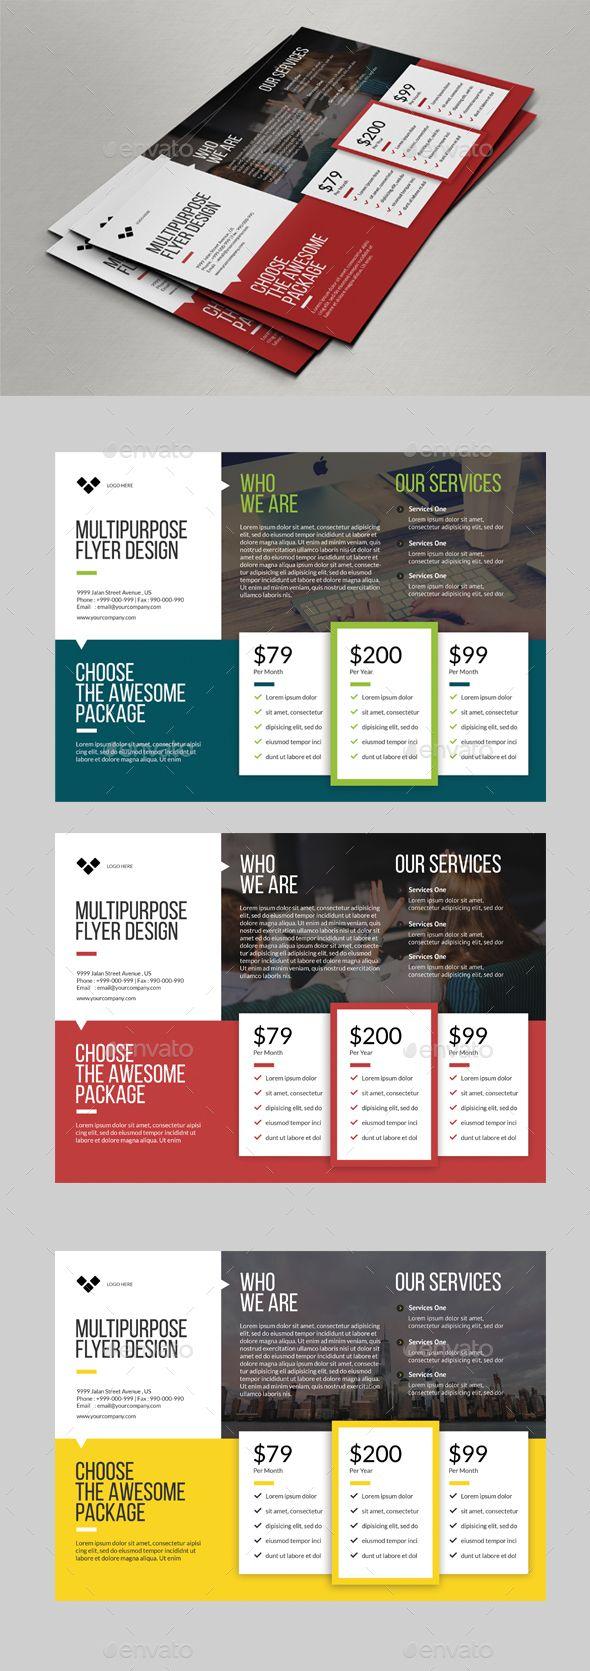 multipurpose flyer price designs pinterest flyer template